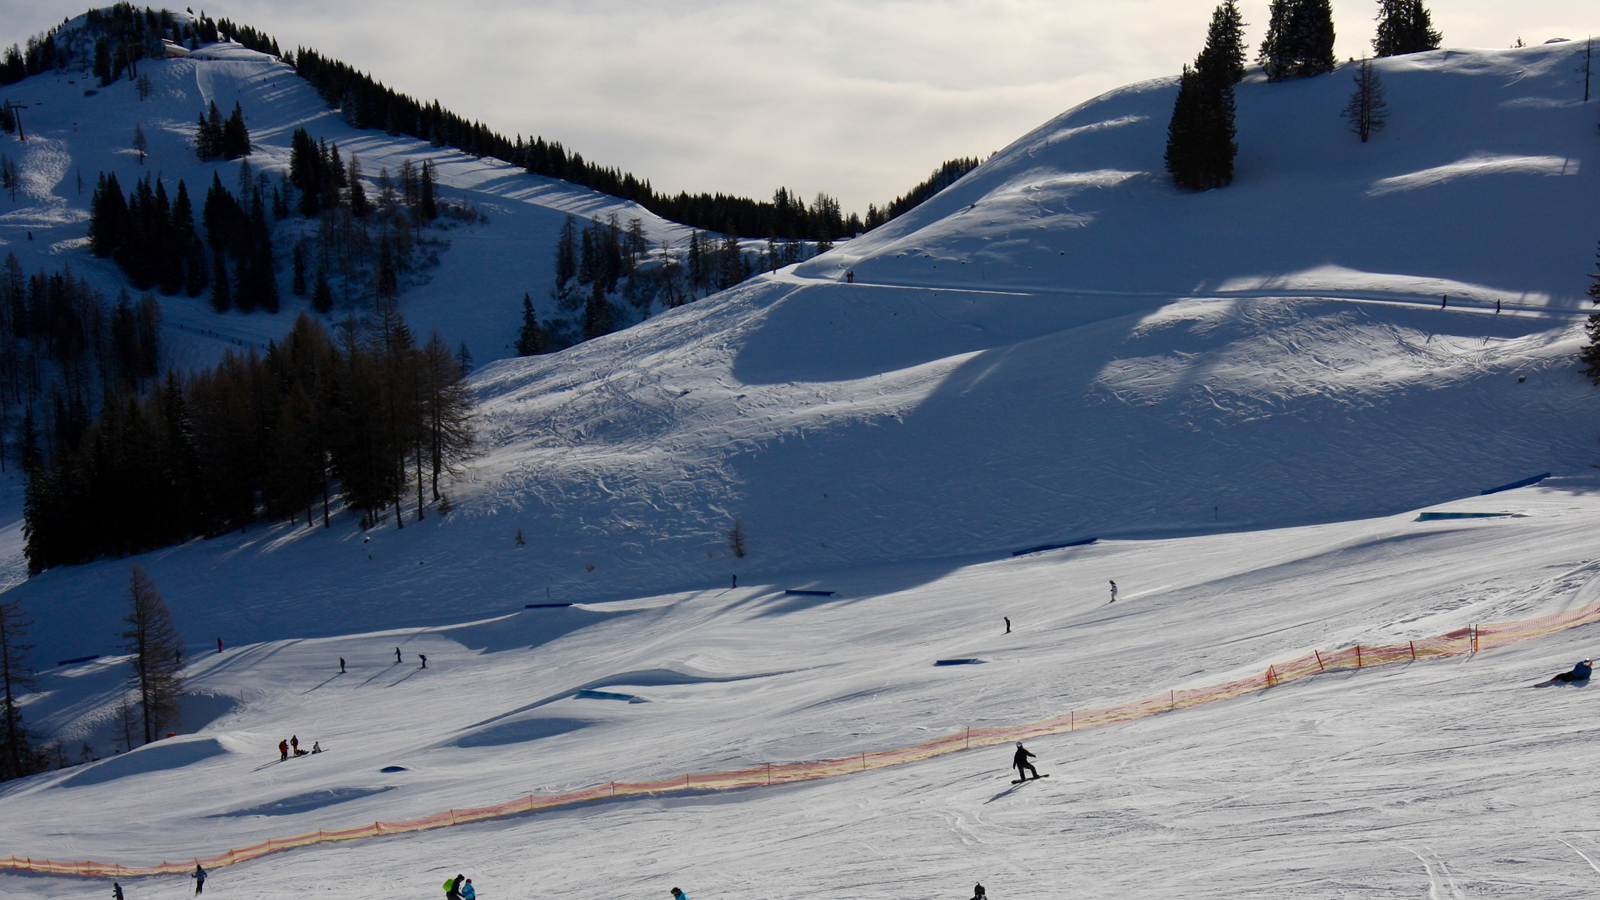 Betterpark Alpendorf: Overview Part 2